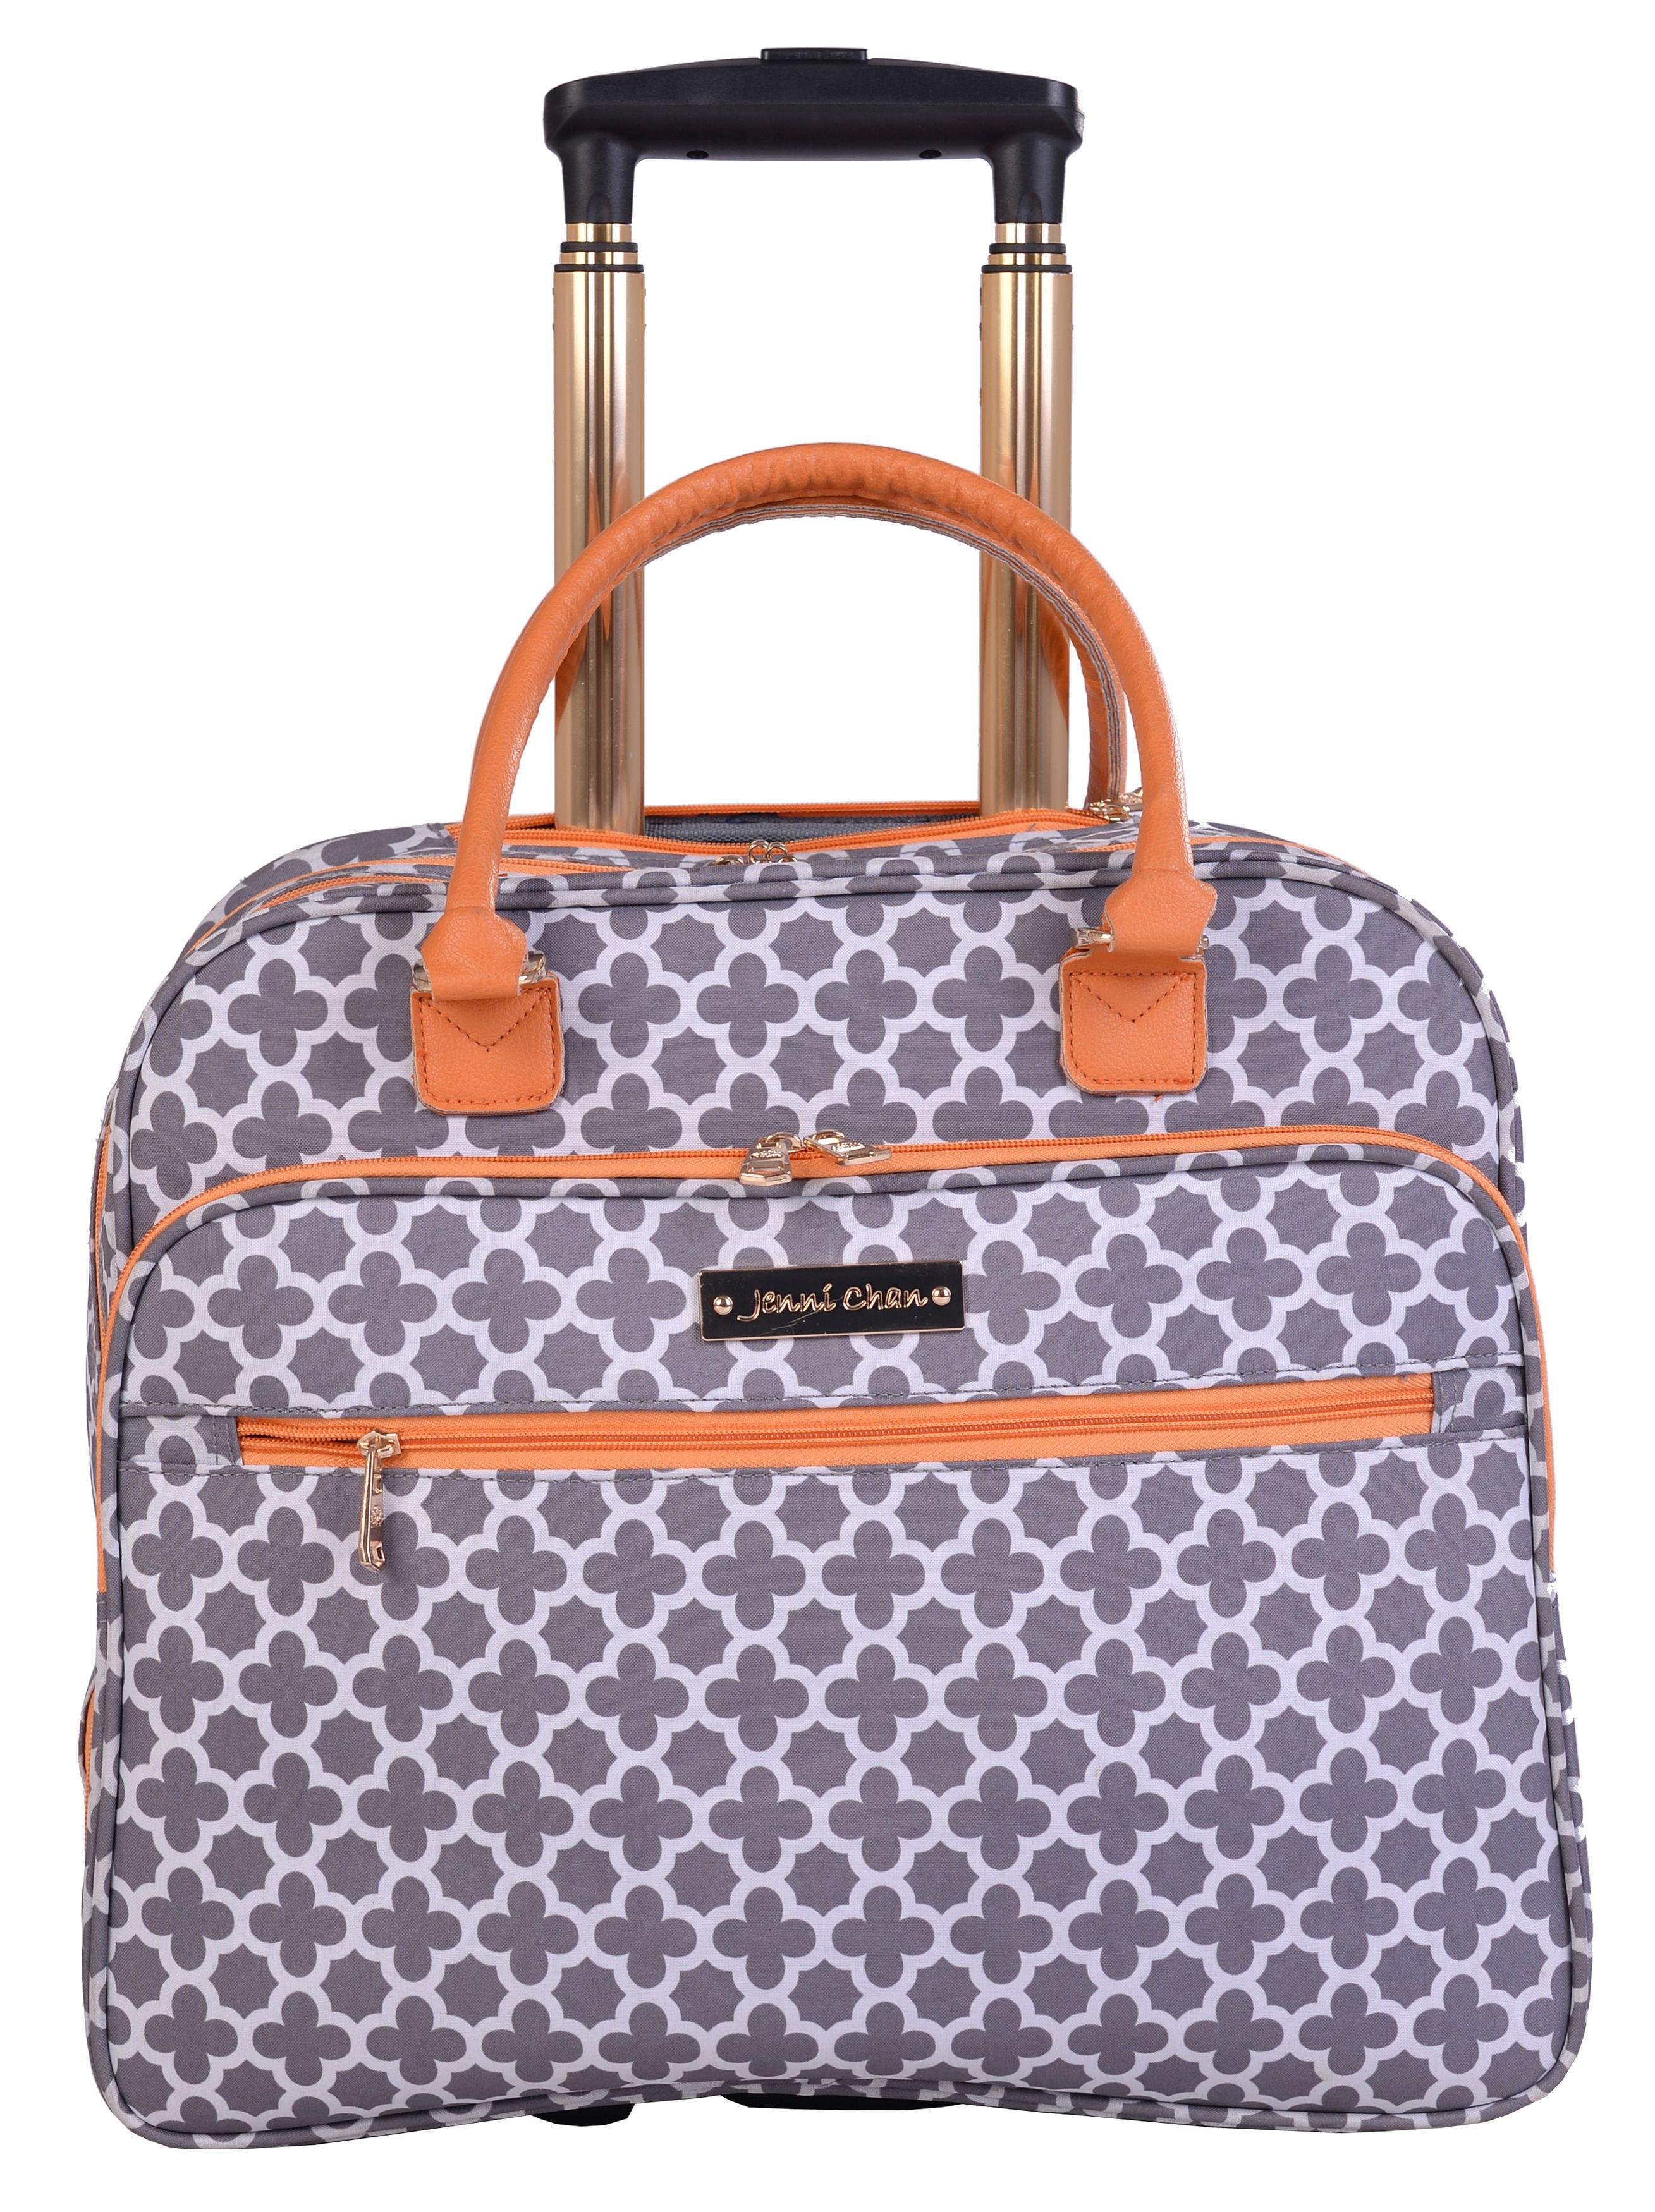 Grey Jenni Chan Medley 2-Piece Set 28 Upright Spinner 311 Bag